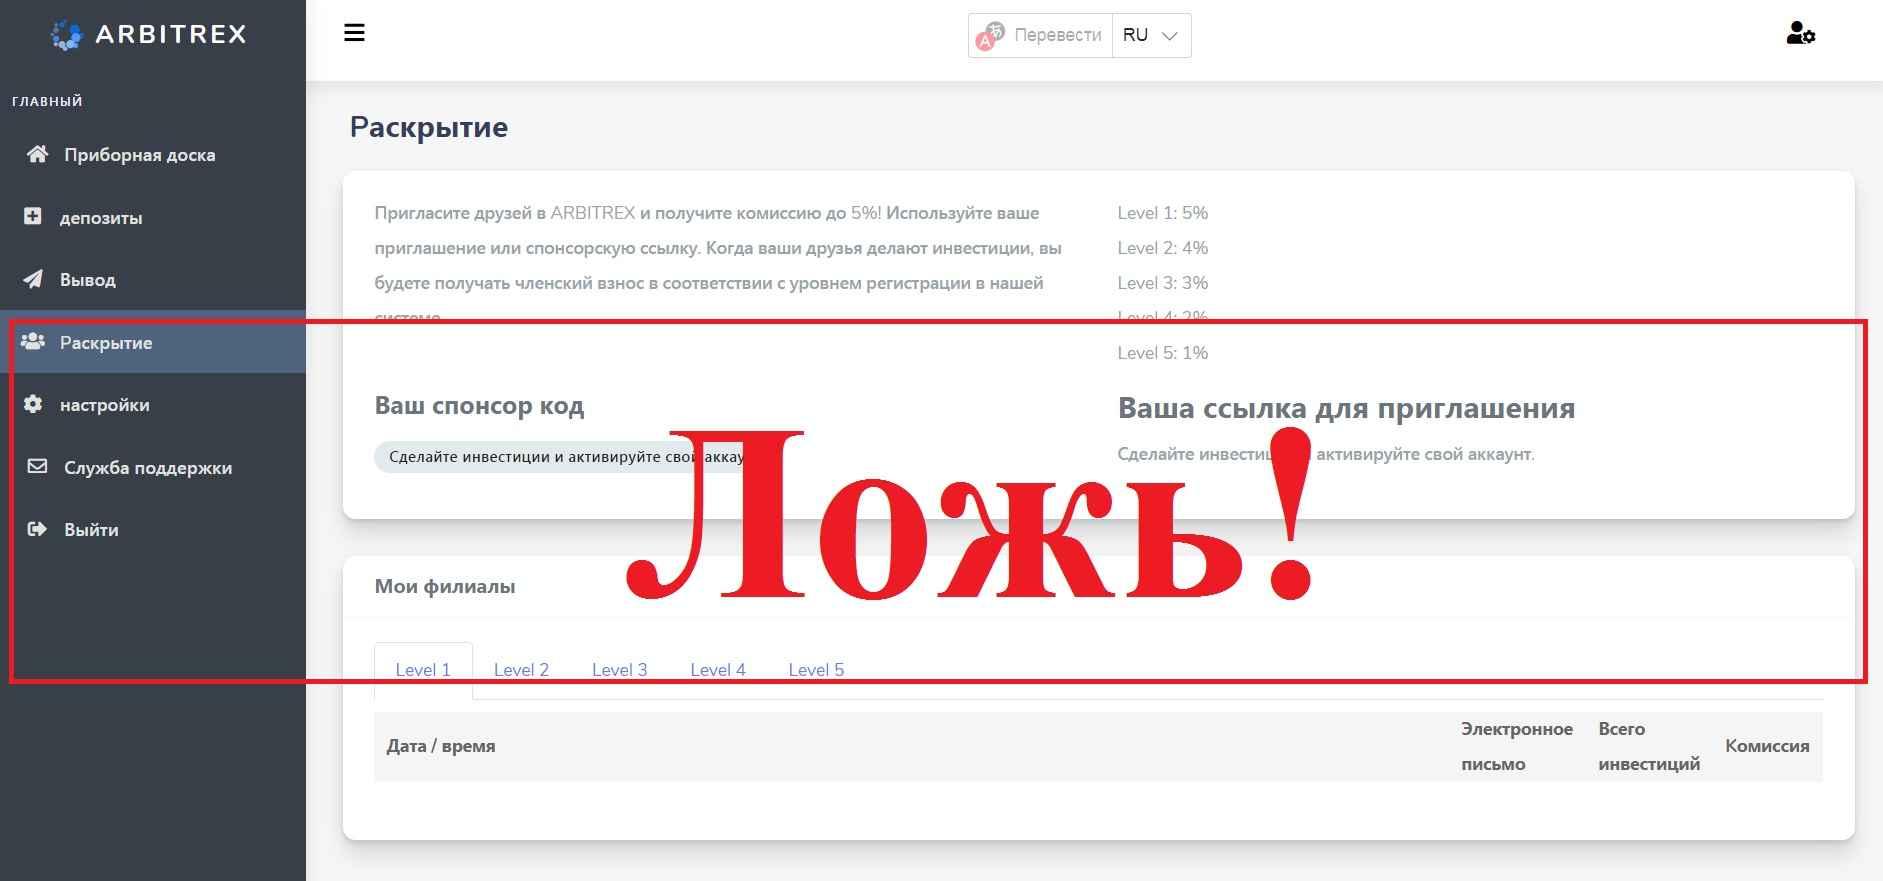 Arbitrex – арбитражная платформа. Отзывы о arbitrex.org